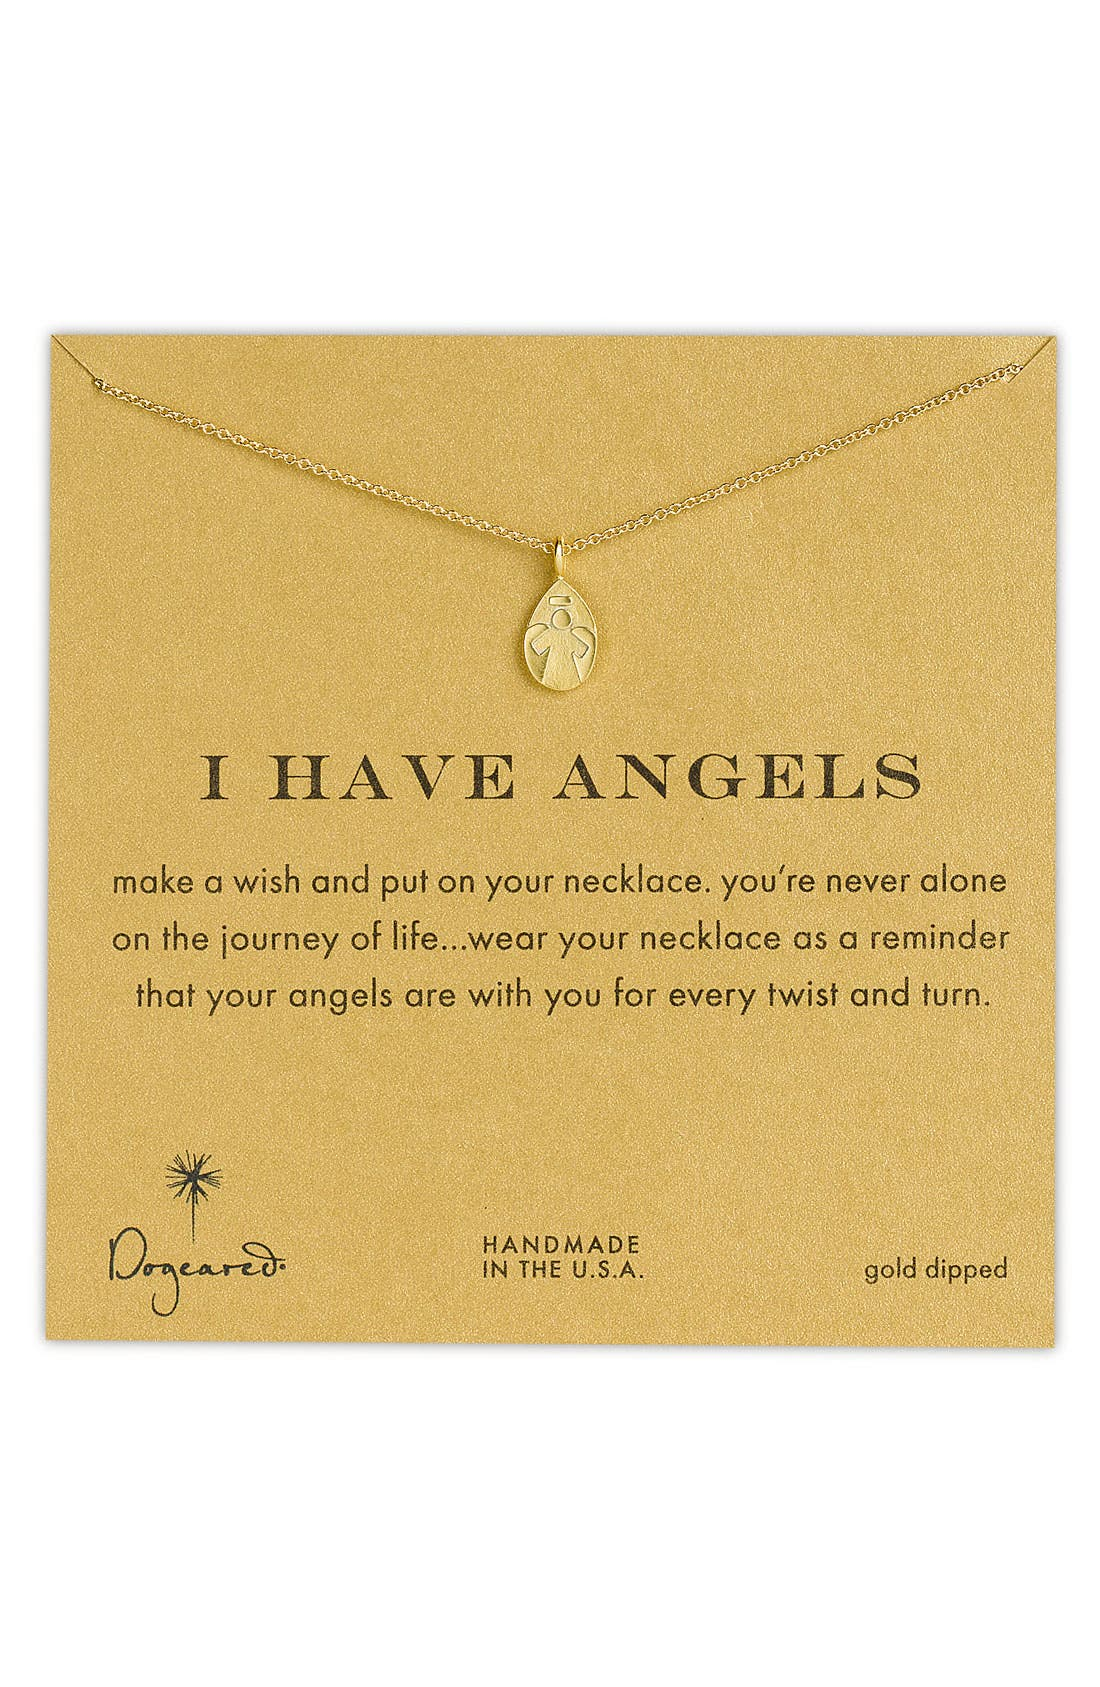 Alternate Image 1 Selected - Dogeared 'Reminder - I Have Angels' Pendant Necklace (Nordstrom Exclusive)